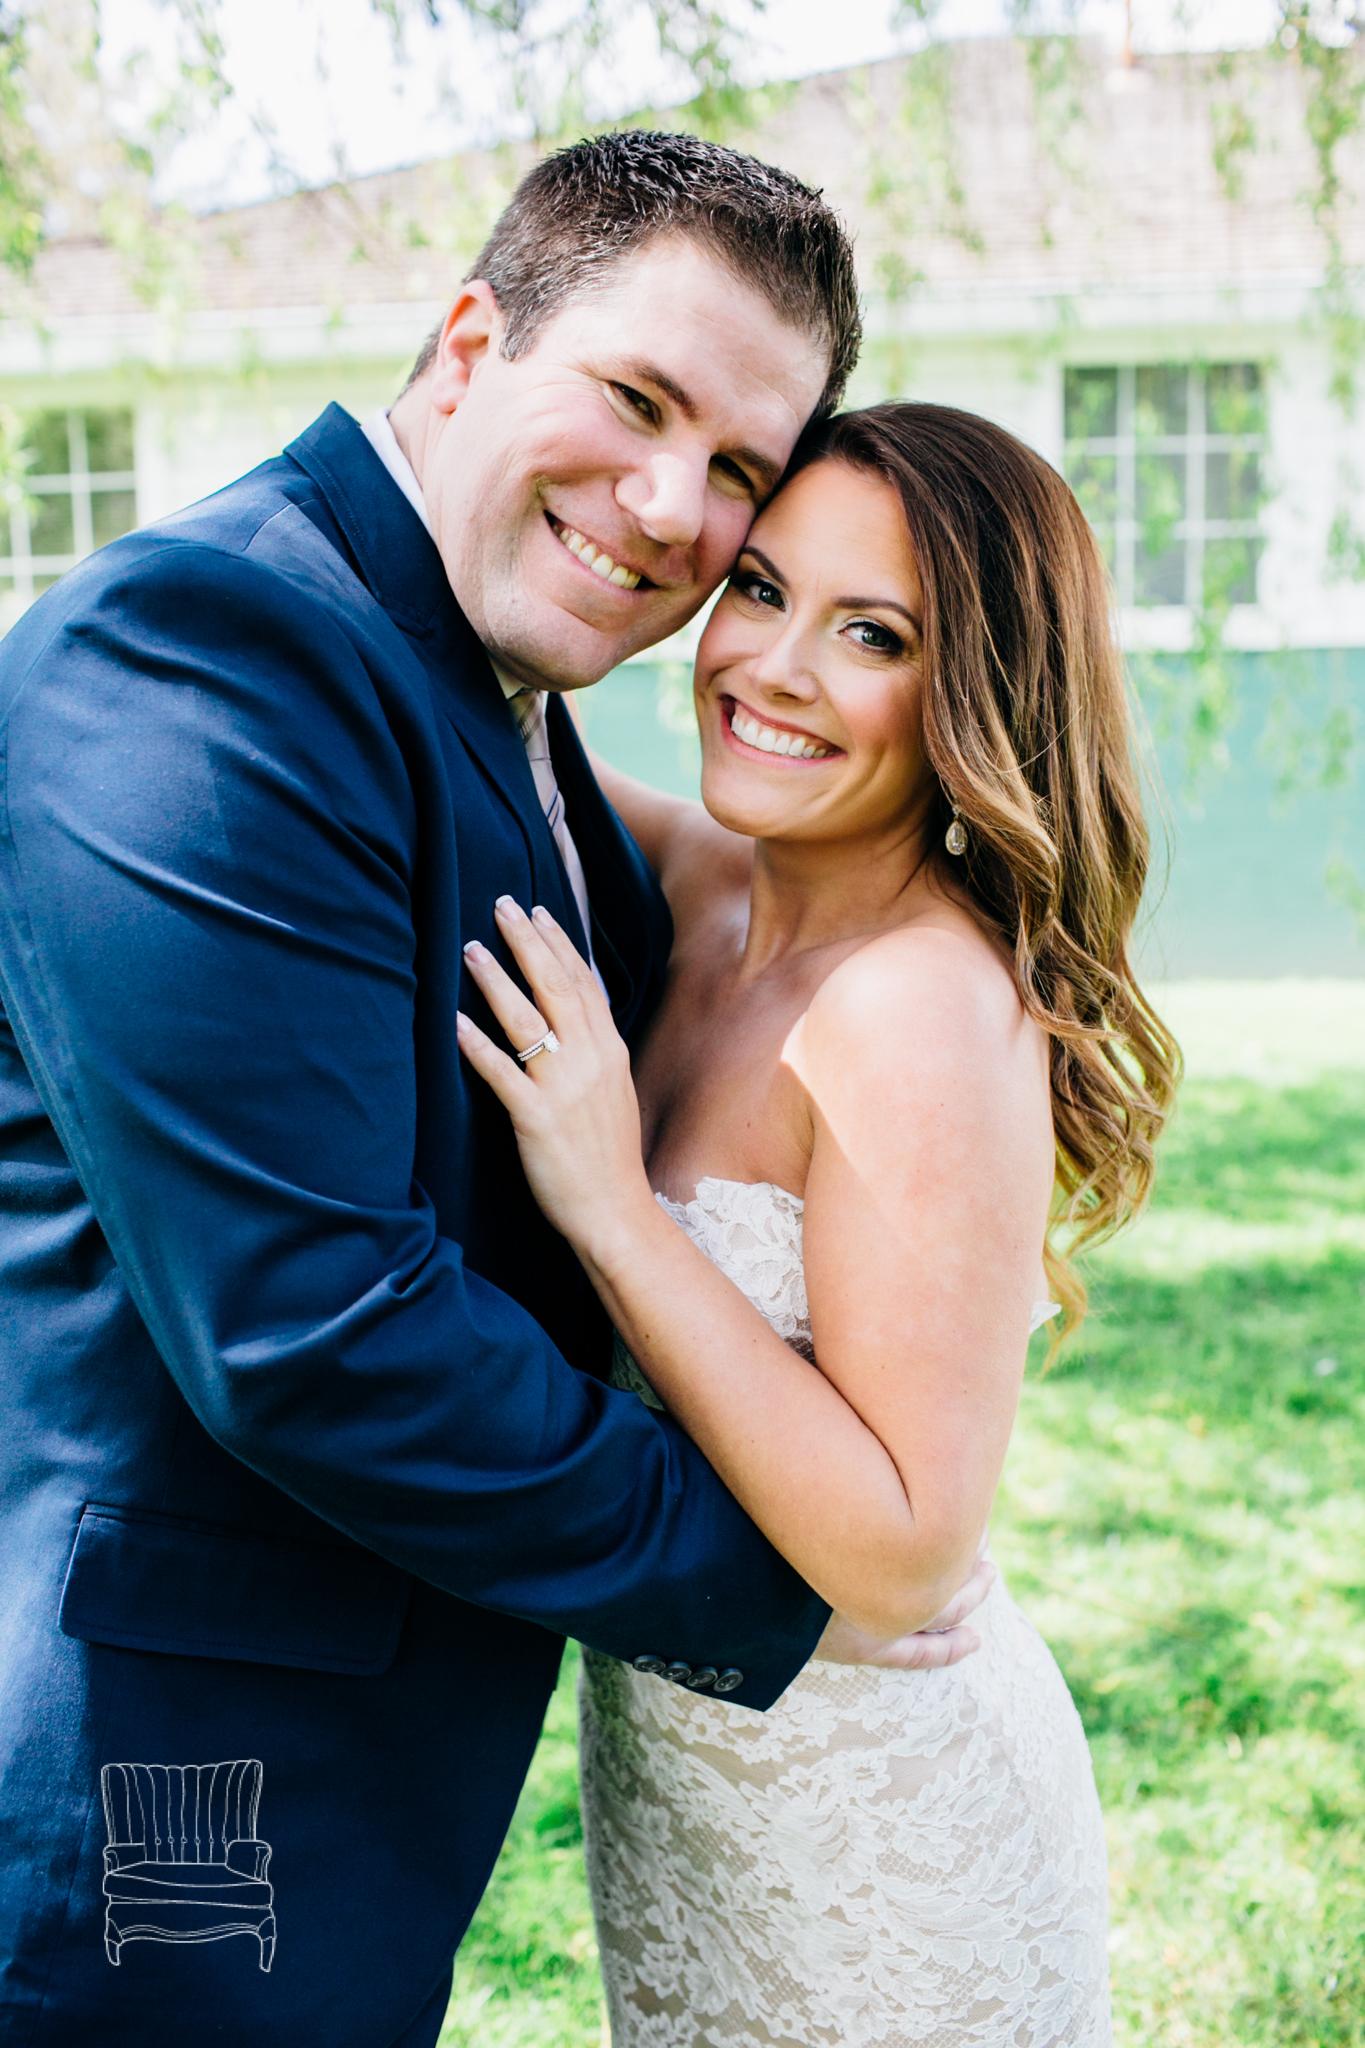 seattle-wedding-photographer-katheryn-moran-russells-bothell-wilkins-wedding-photo-23.jpg